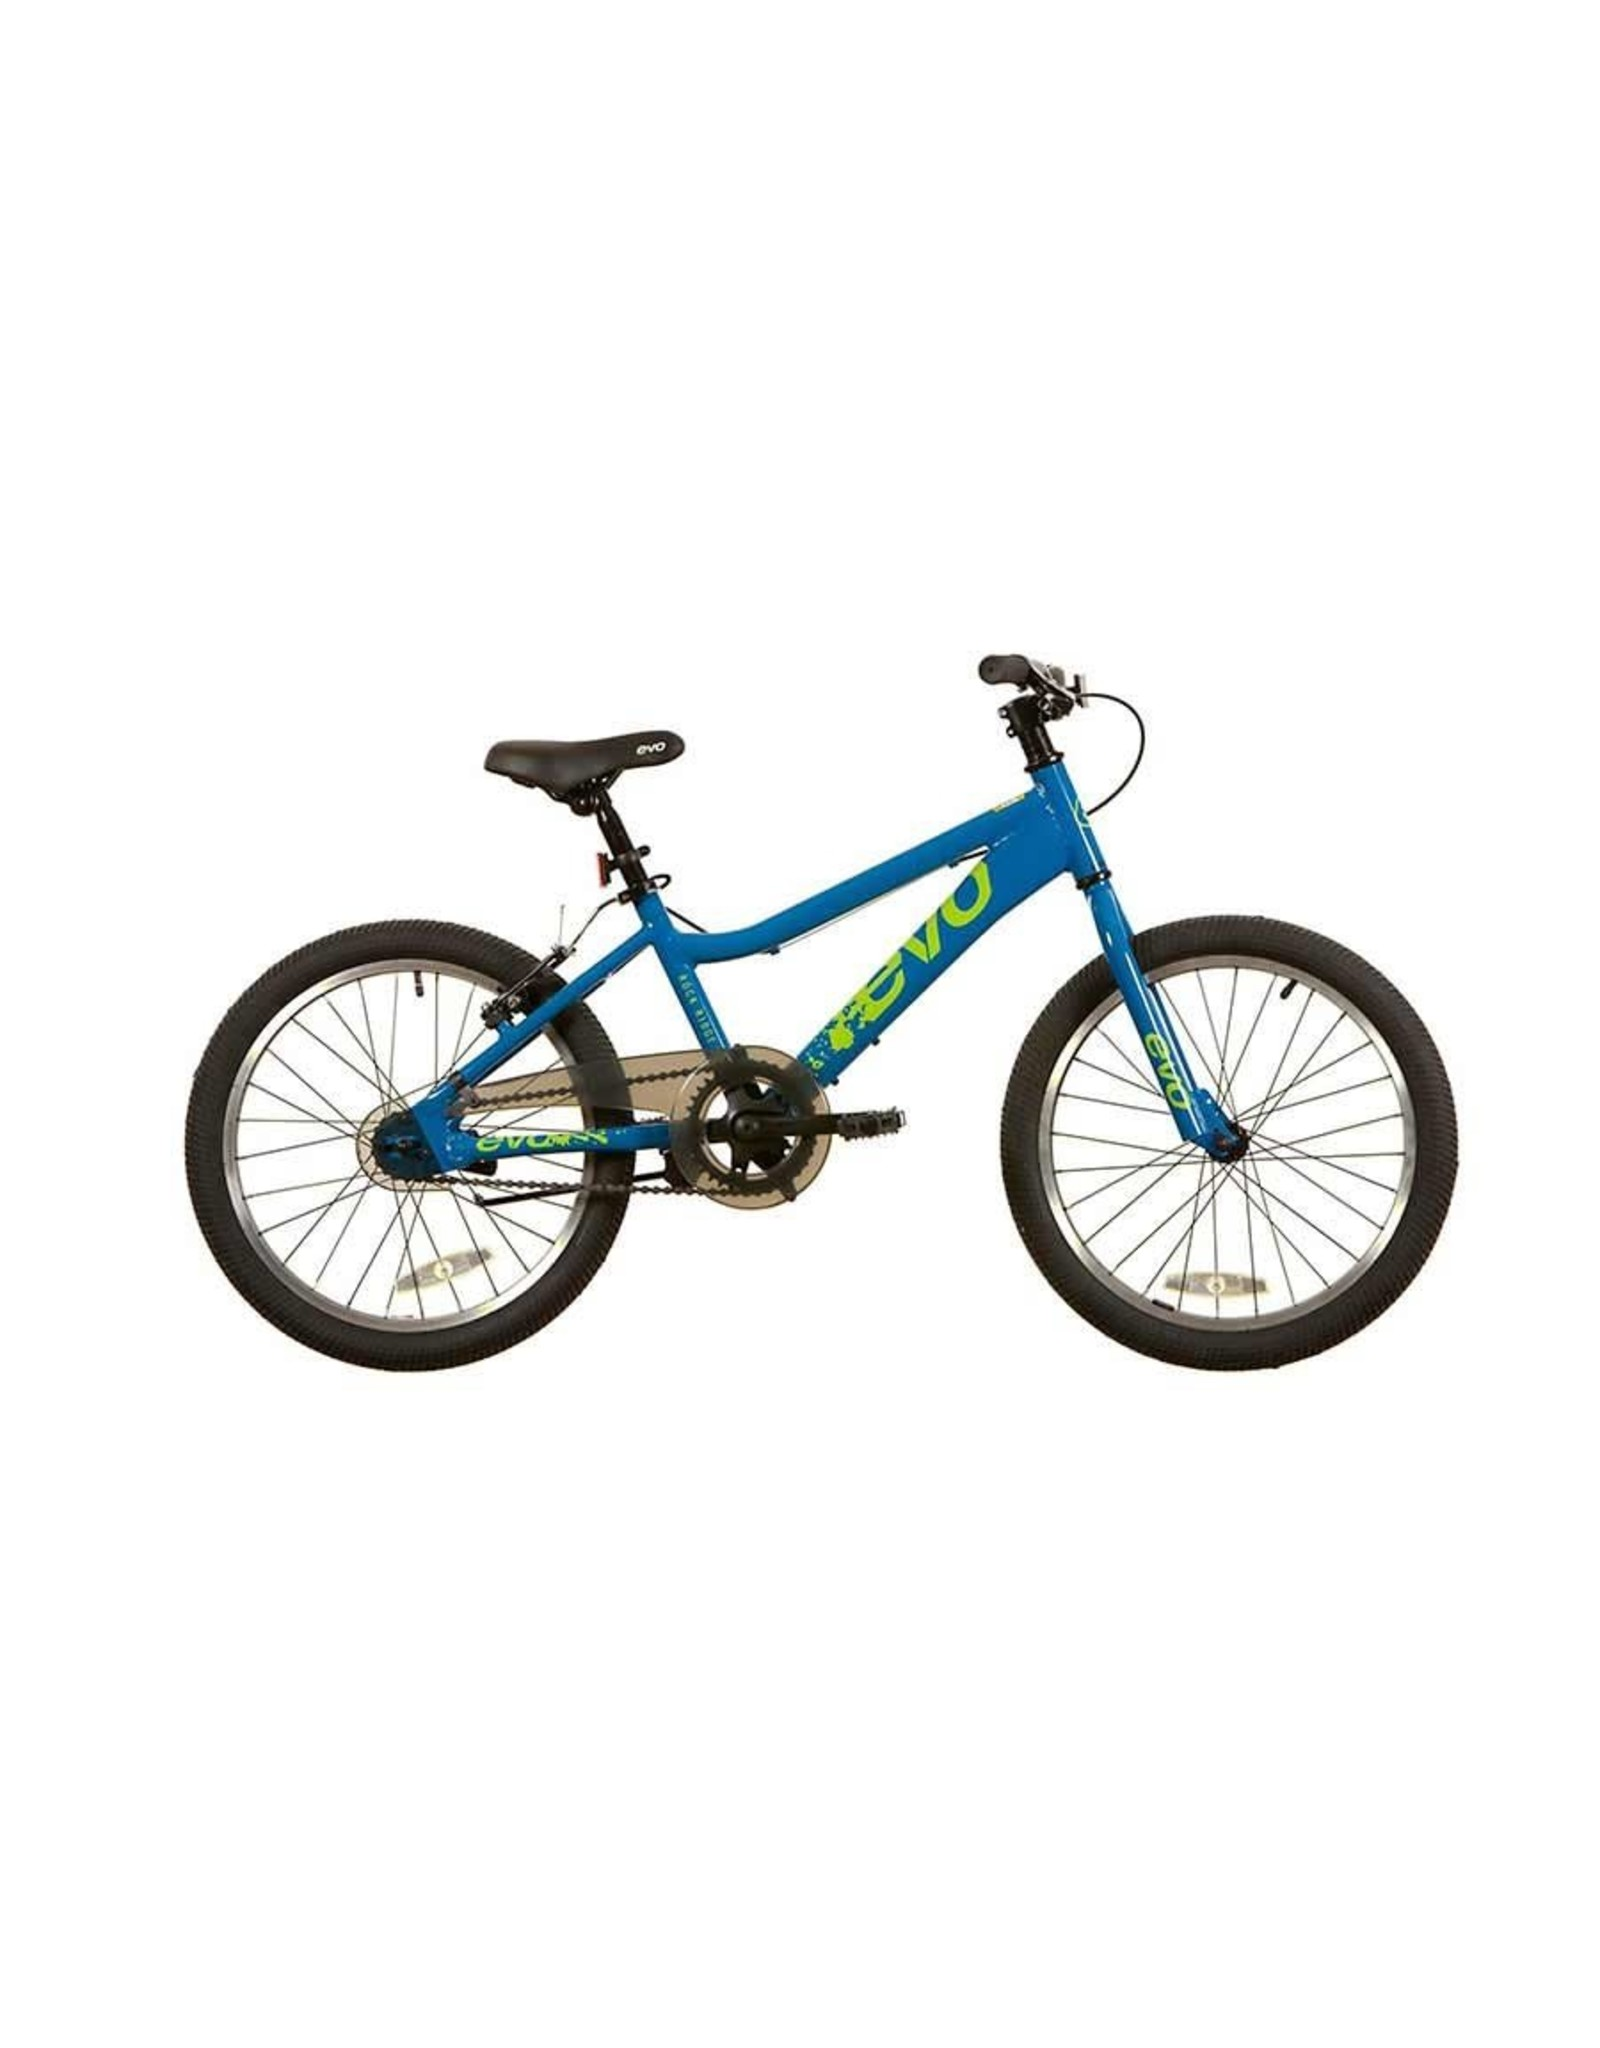 EVO EVO, Rock Ridge 20, Kids Bicycle, 20'', Big Blue/Neo Green, U